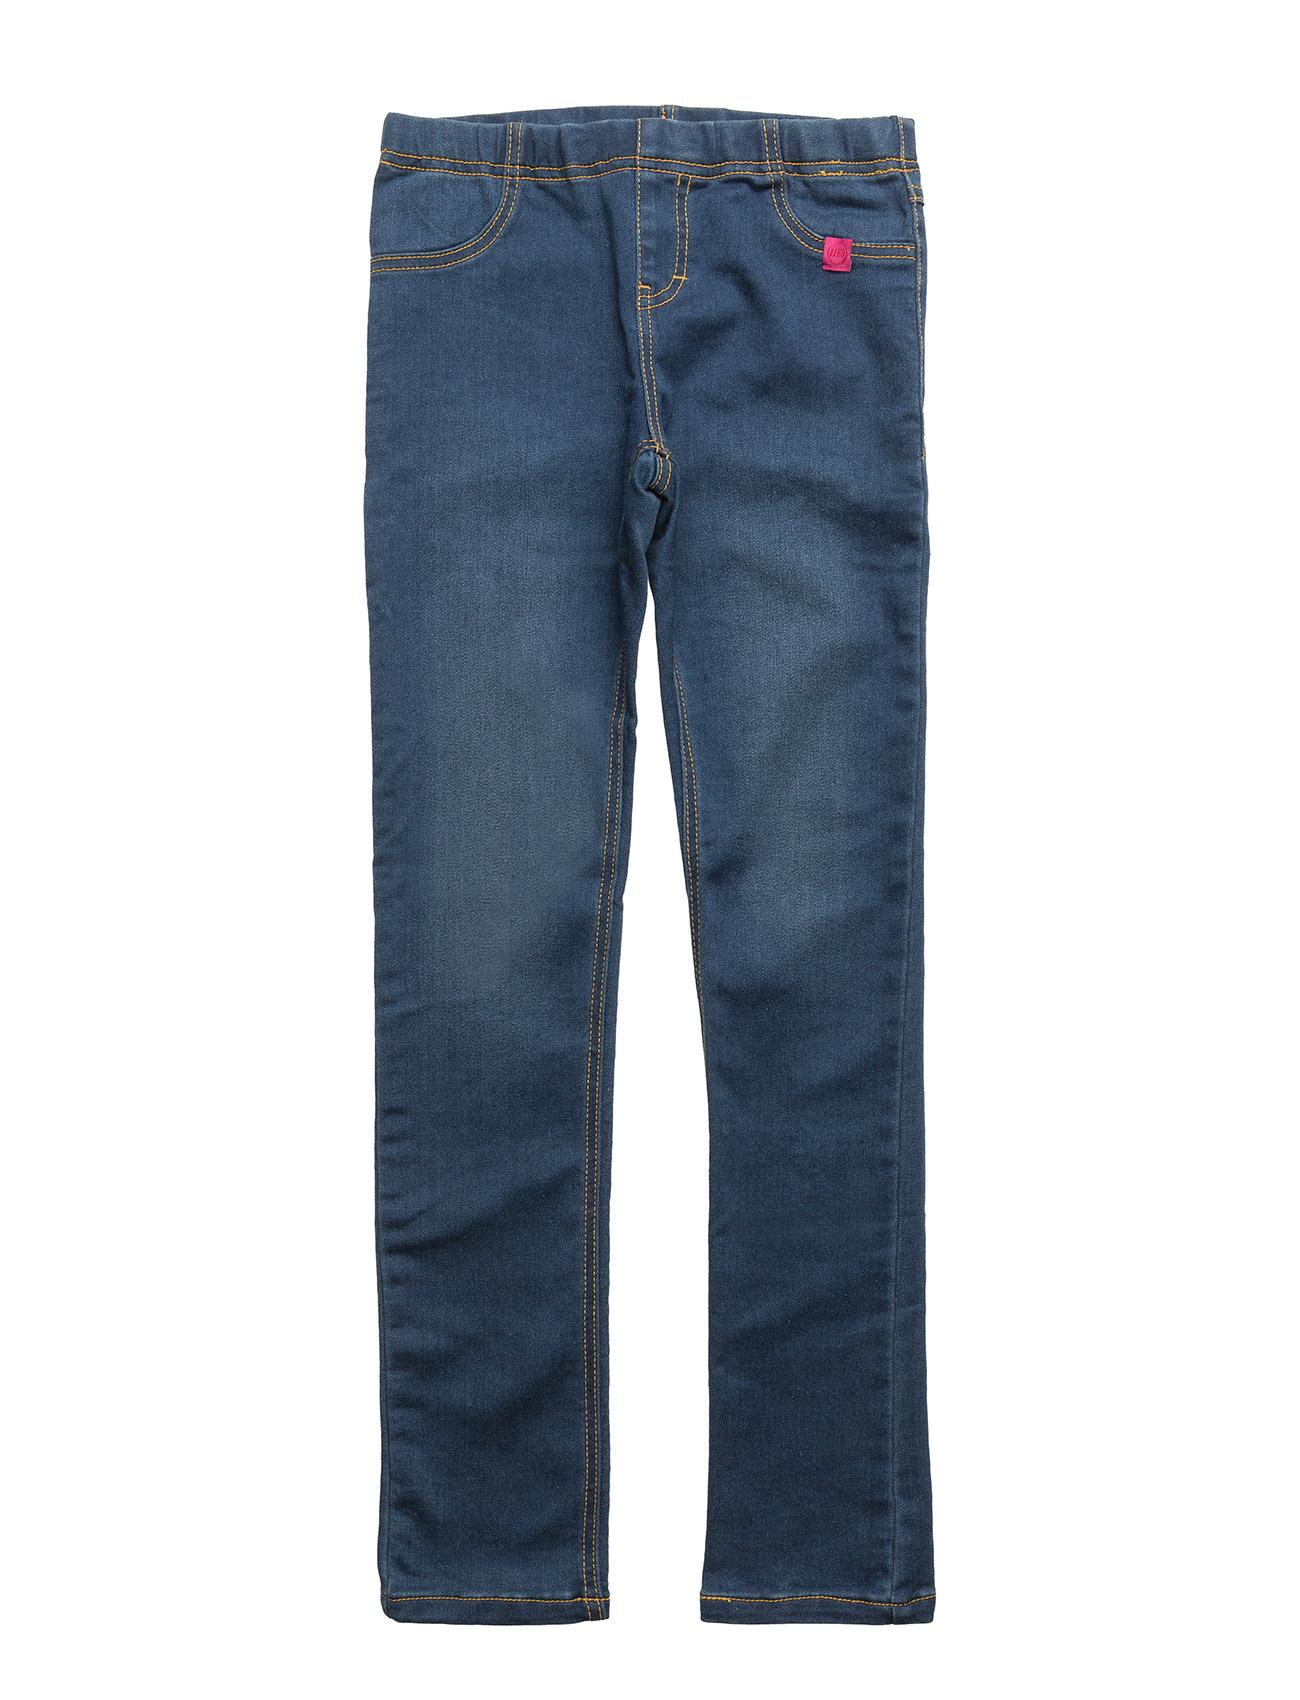 Invent 501 – Jeans